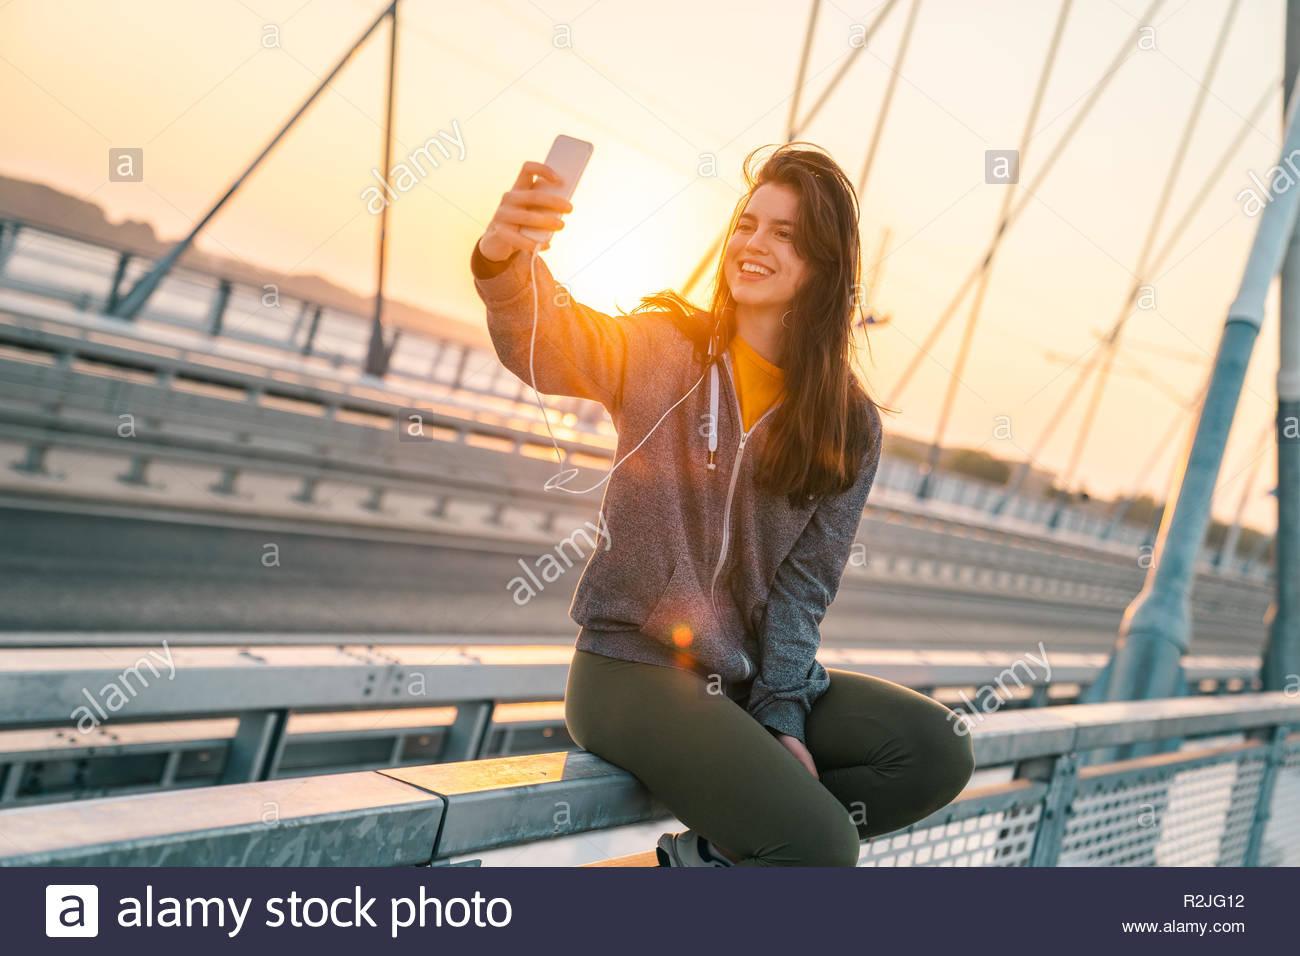 Beautiful sportswoman taking a selfie while sitting on the bridge at sunrise. - Stock Image